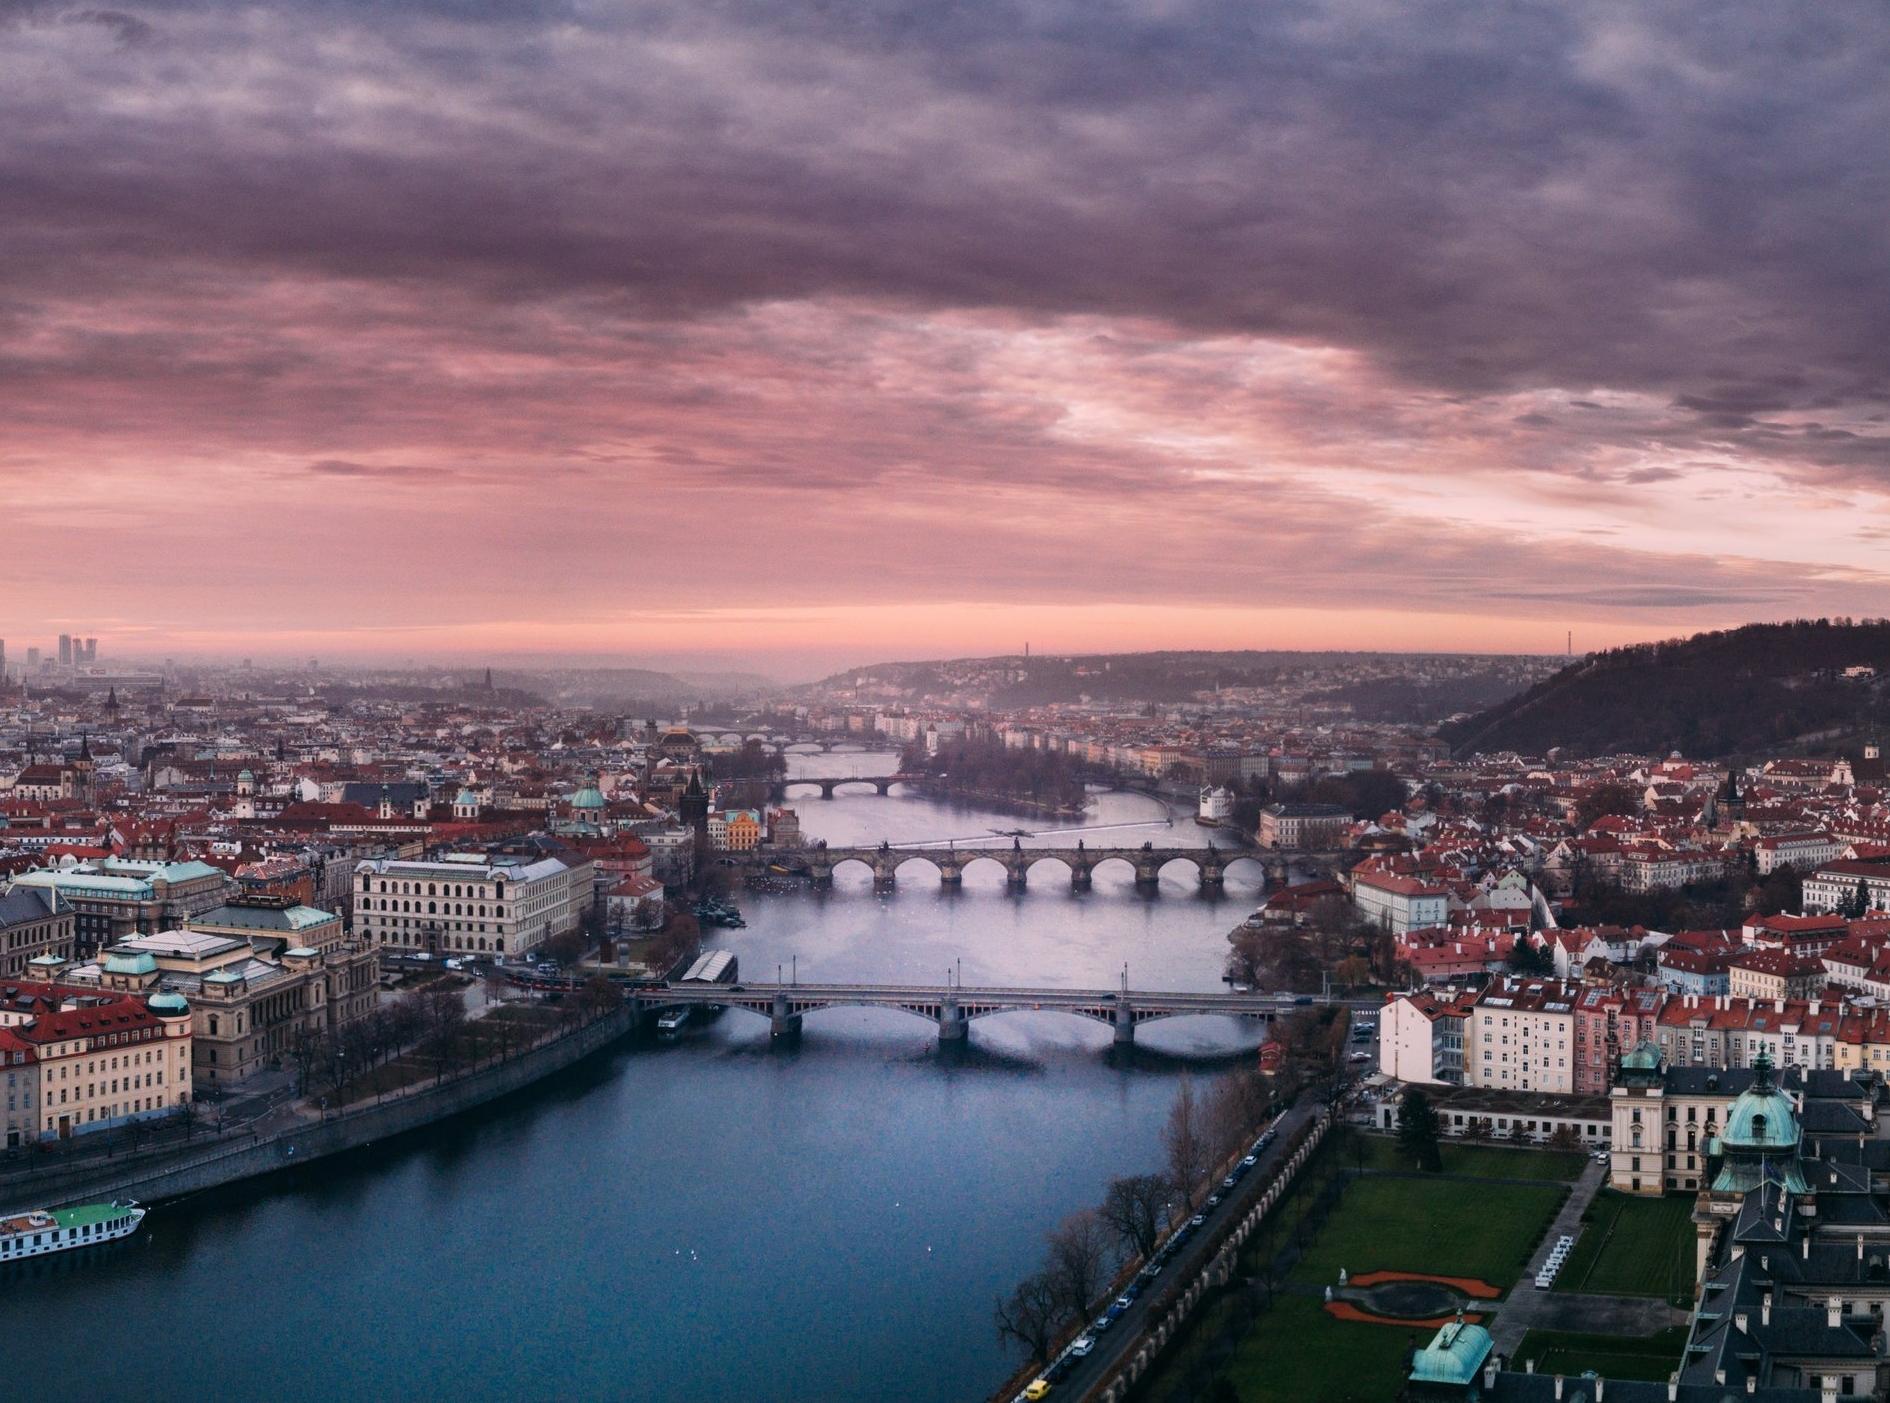 Bohemian 2019 - December 4-6, 2019Four Seasons, Budapest